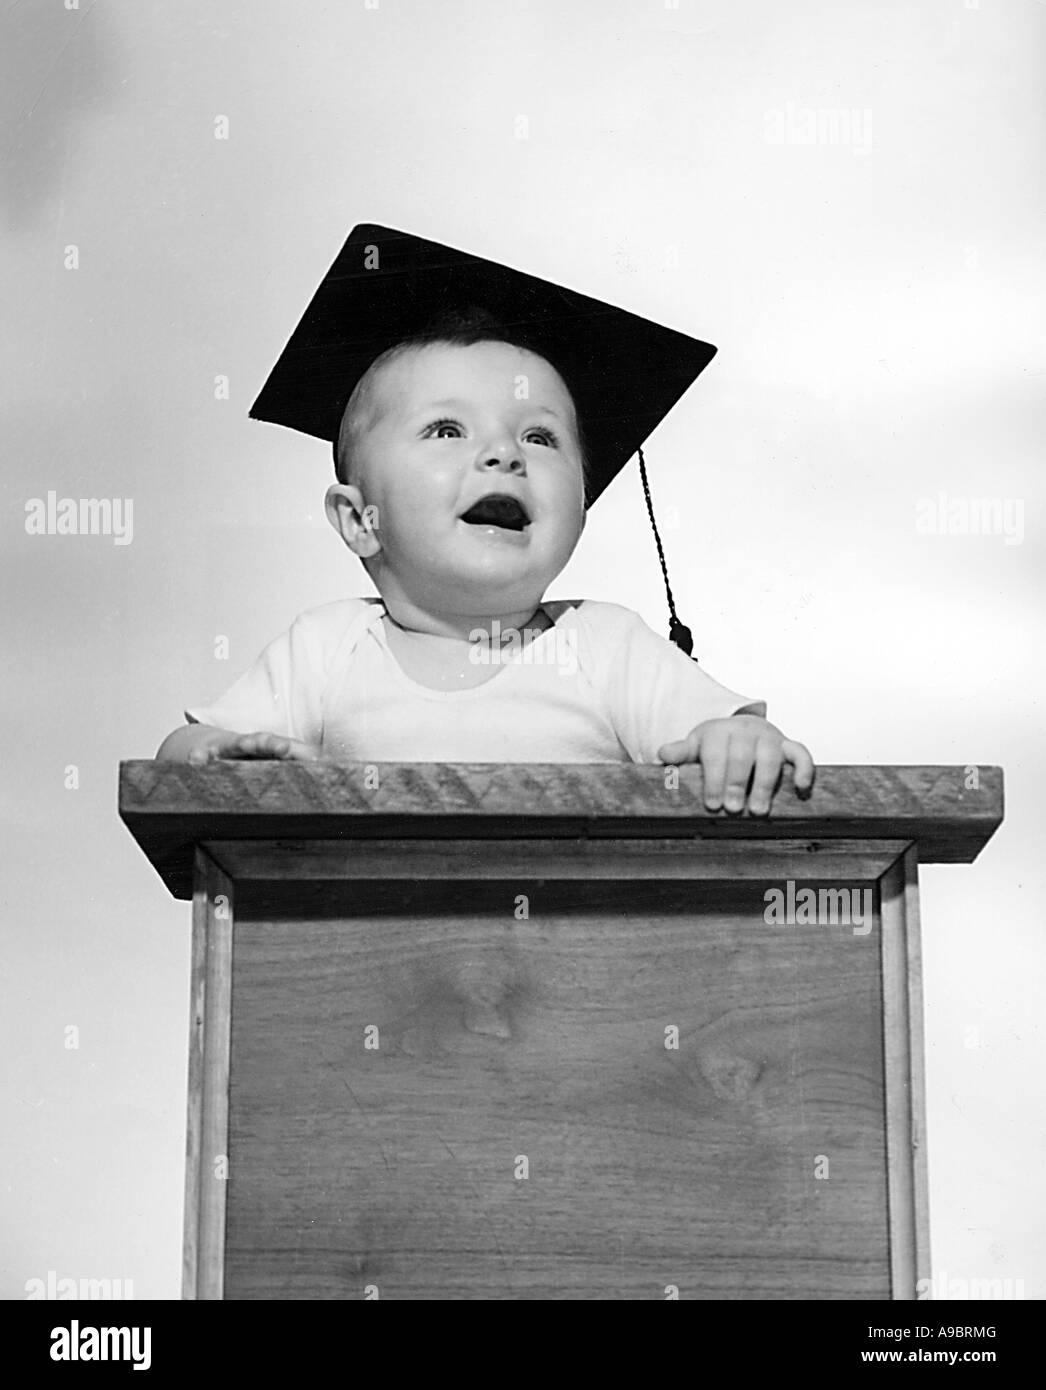 SCHOLAR BABY - Stock Image